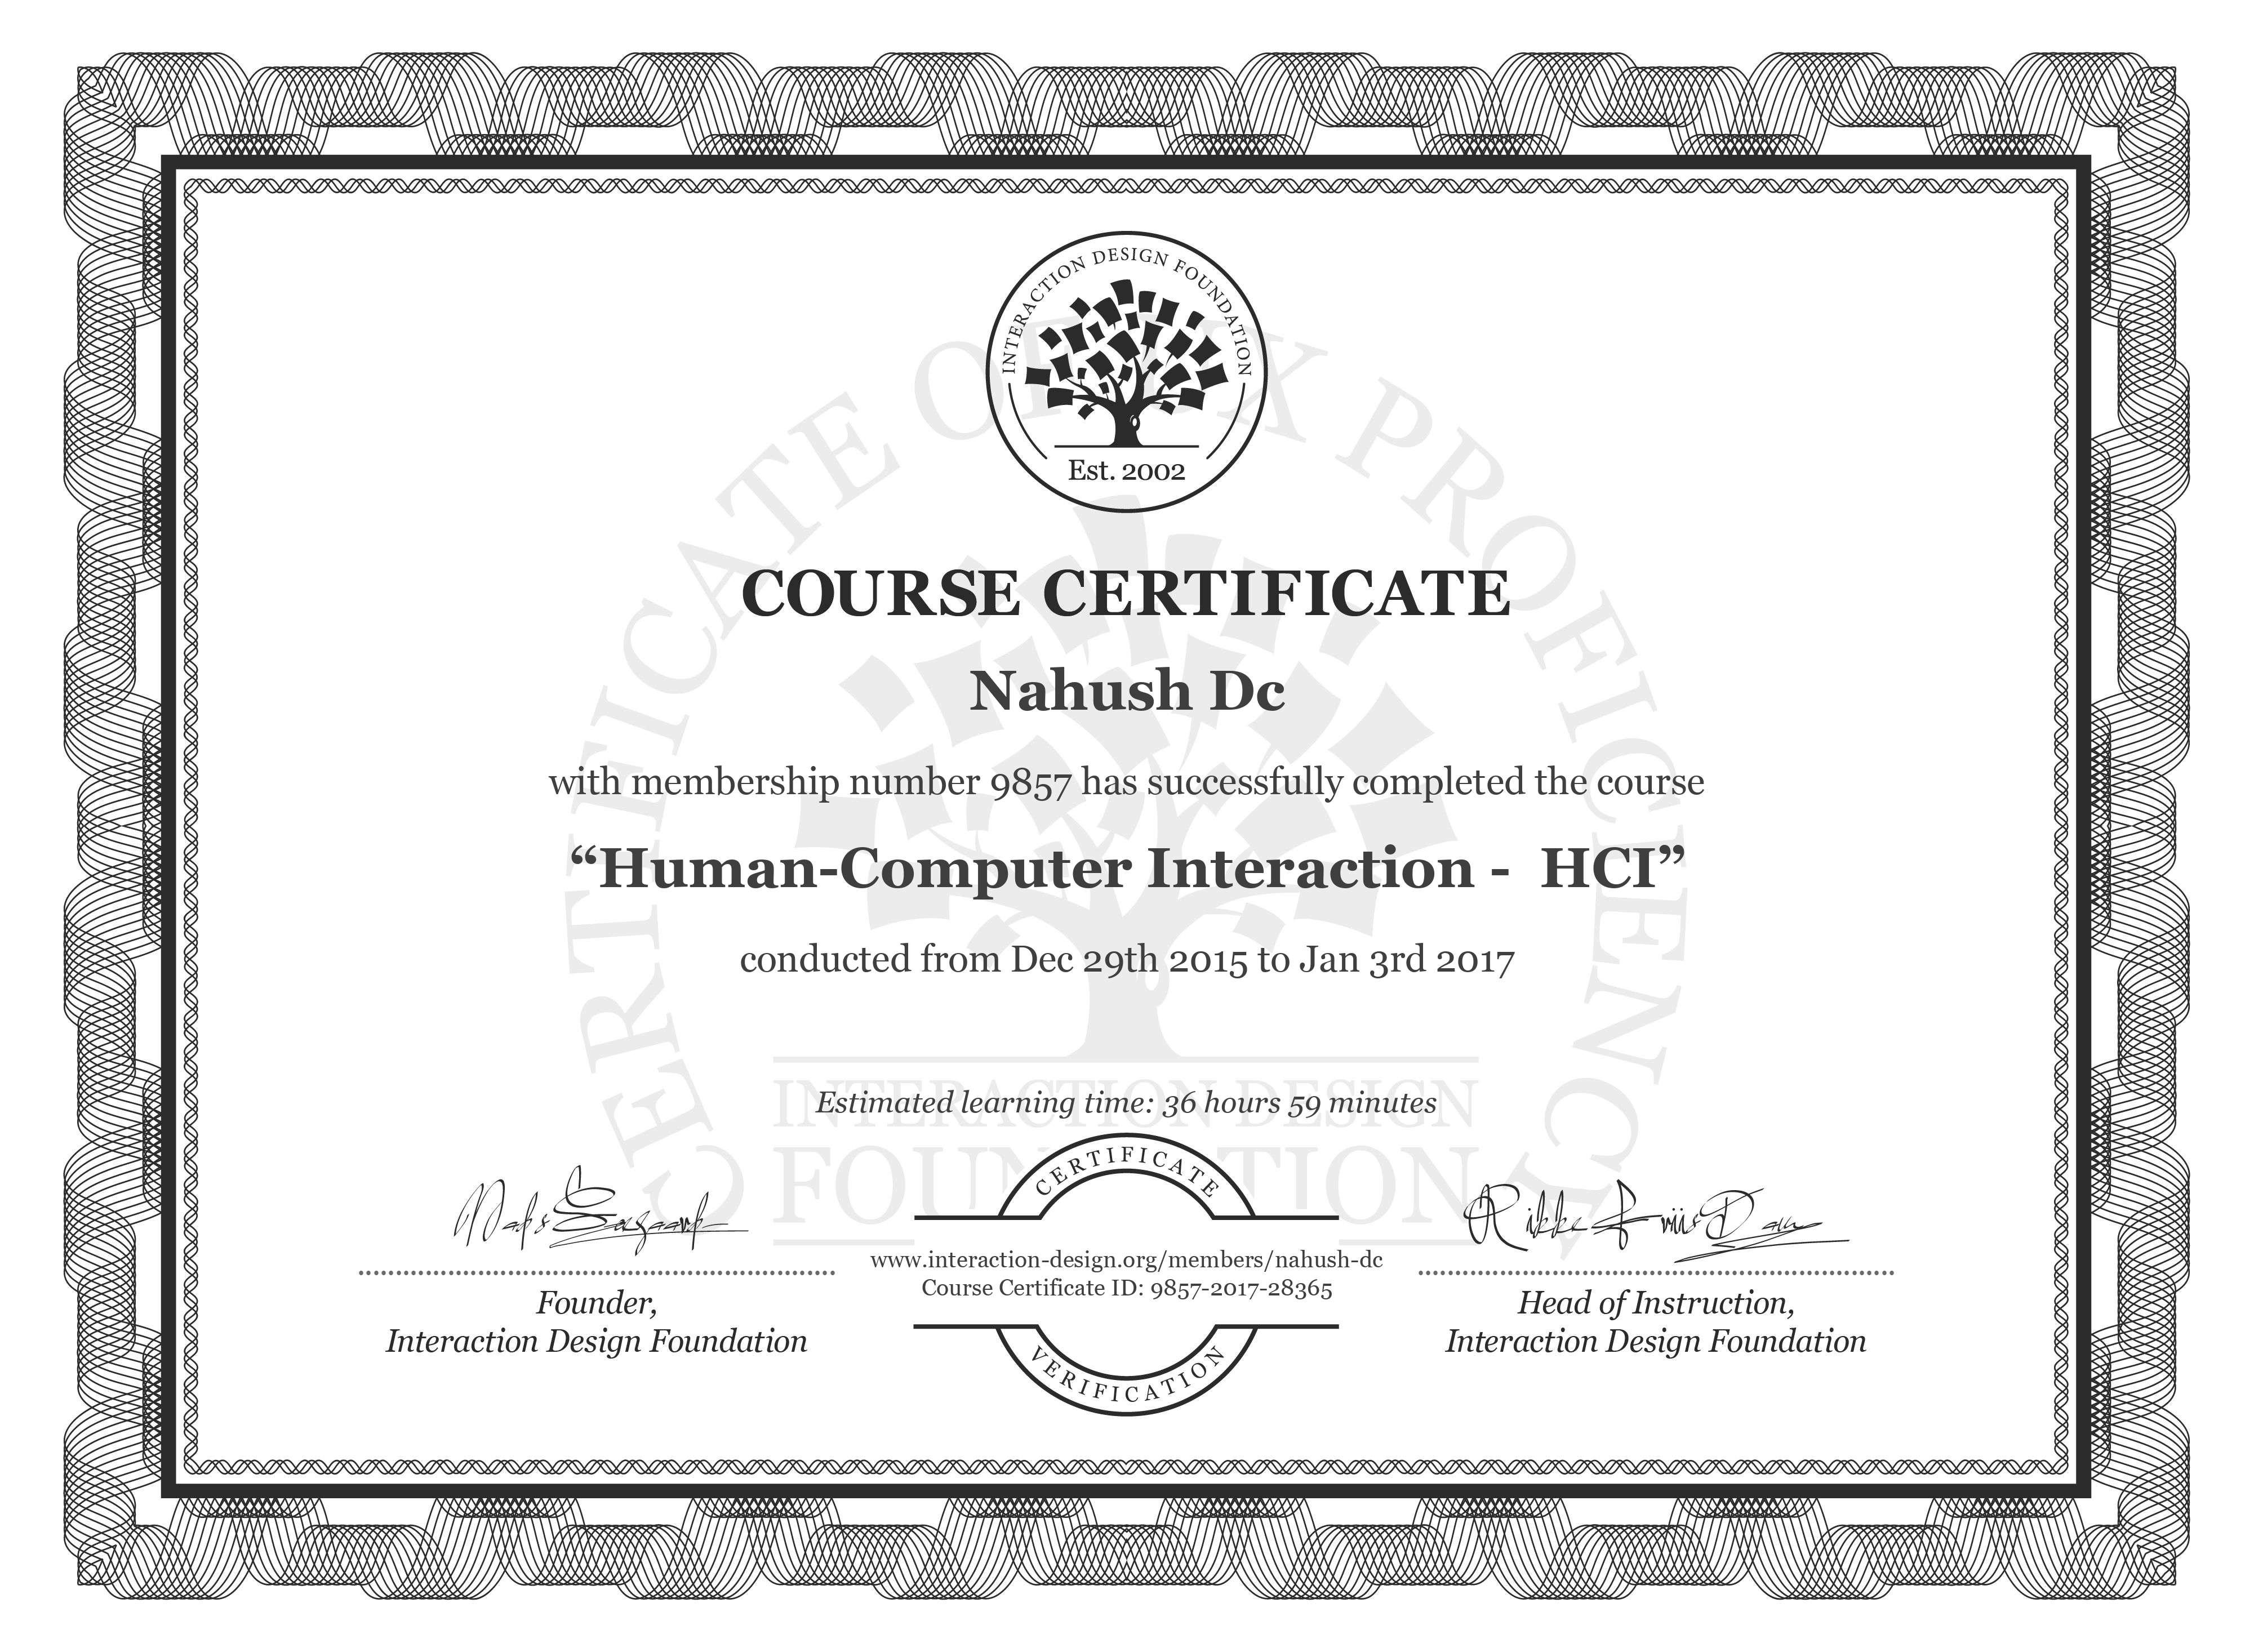 Nahush Dc: Course Certificate - Human-Computer Interaction -  HCI